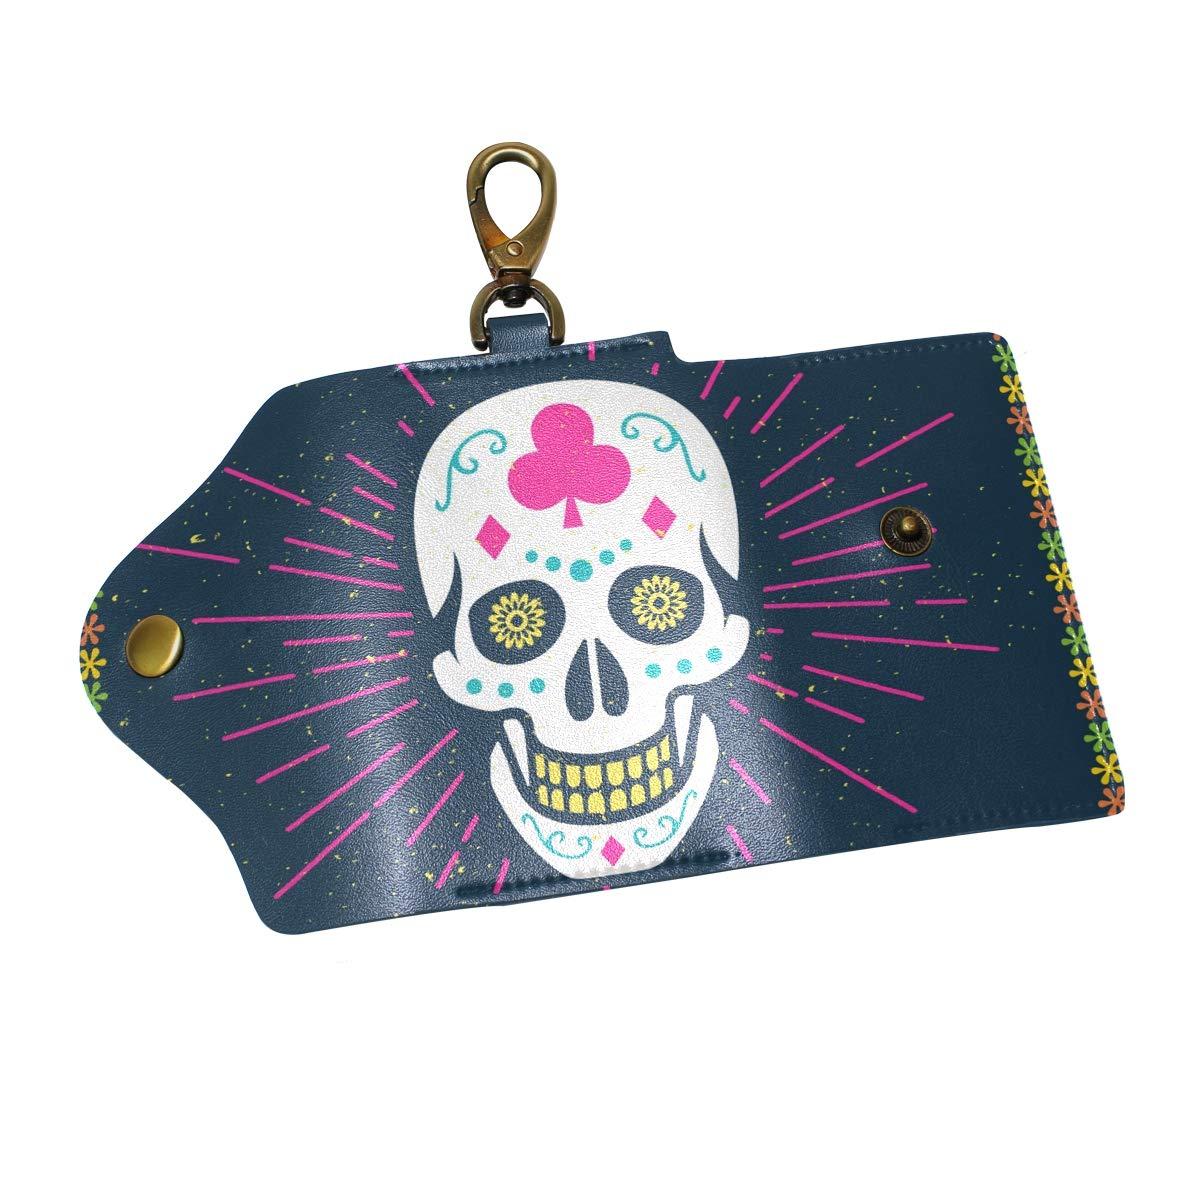 KEAKIA Sugar Skull Leather Key Case Wallets Tri-fold Key Holder Keychains with 6 Hooks 2 Slot Snap Closure for Men Women